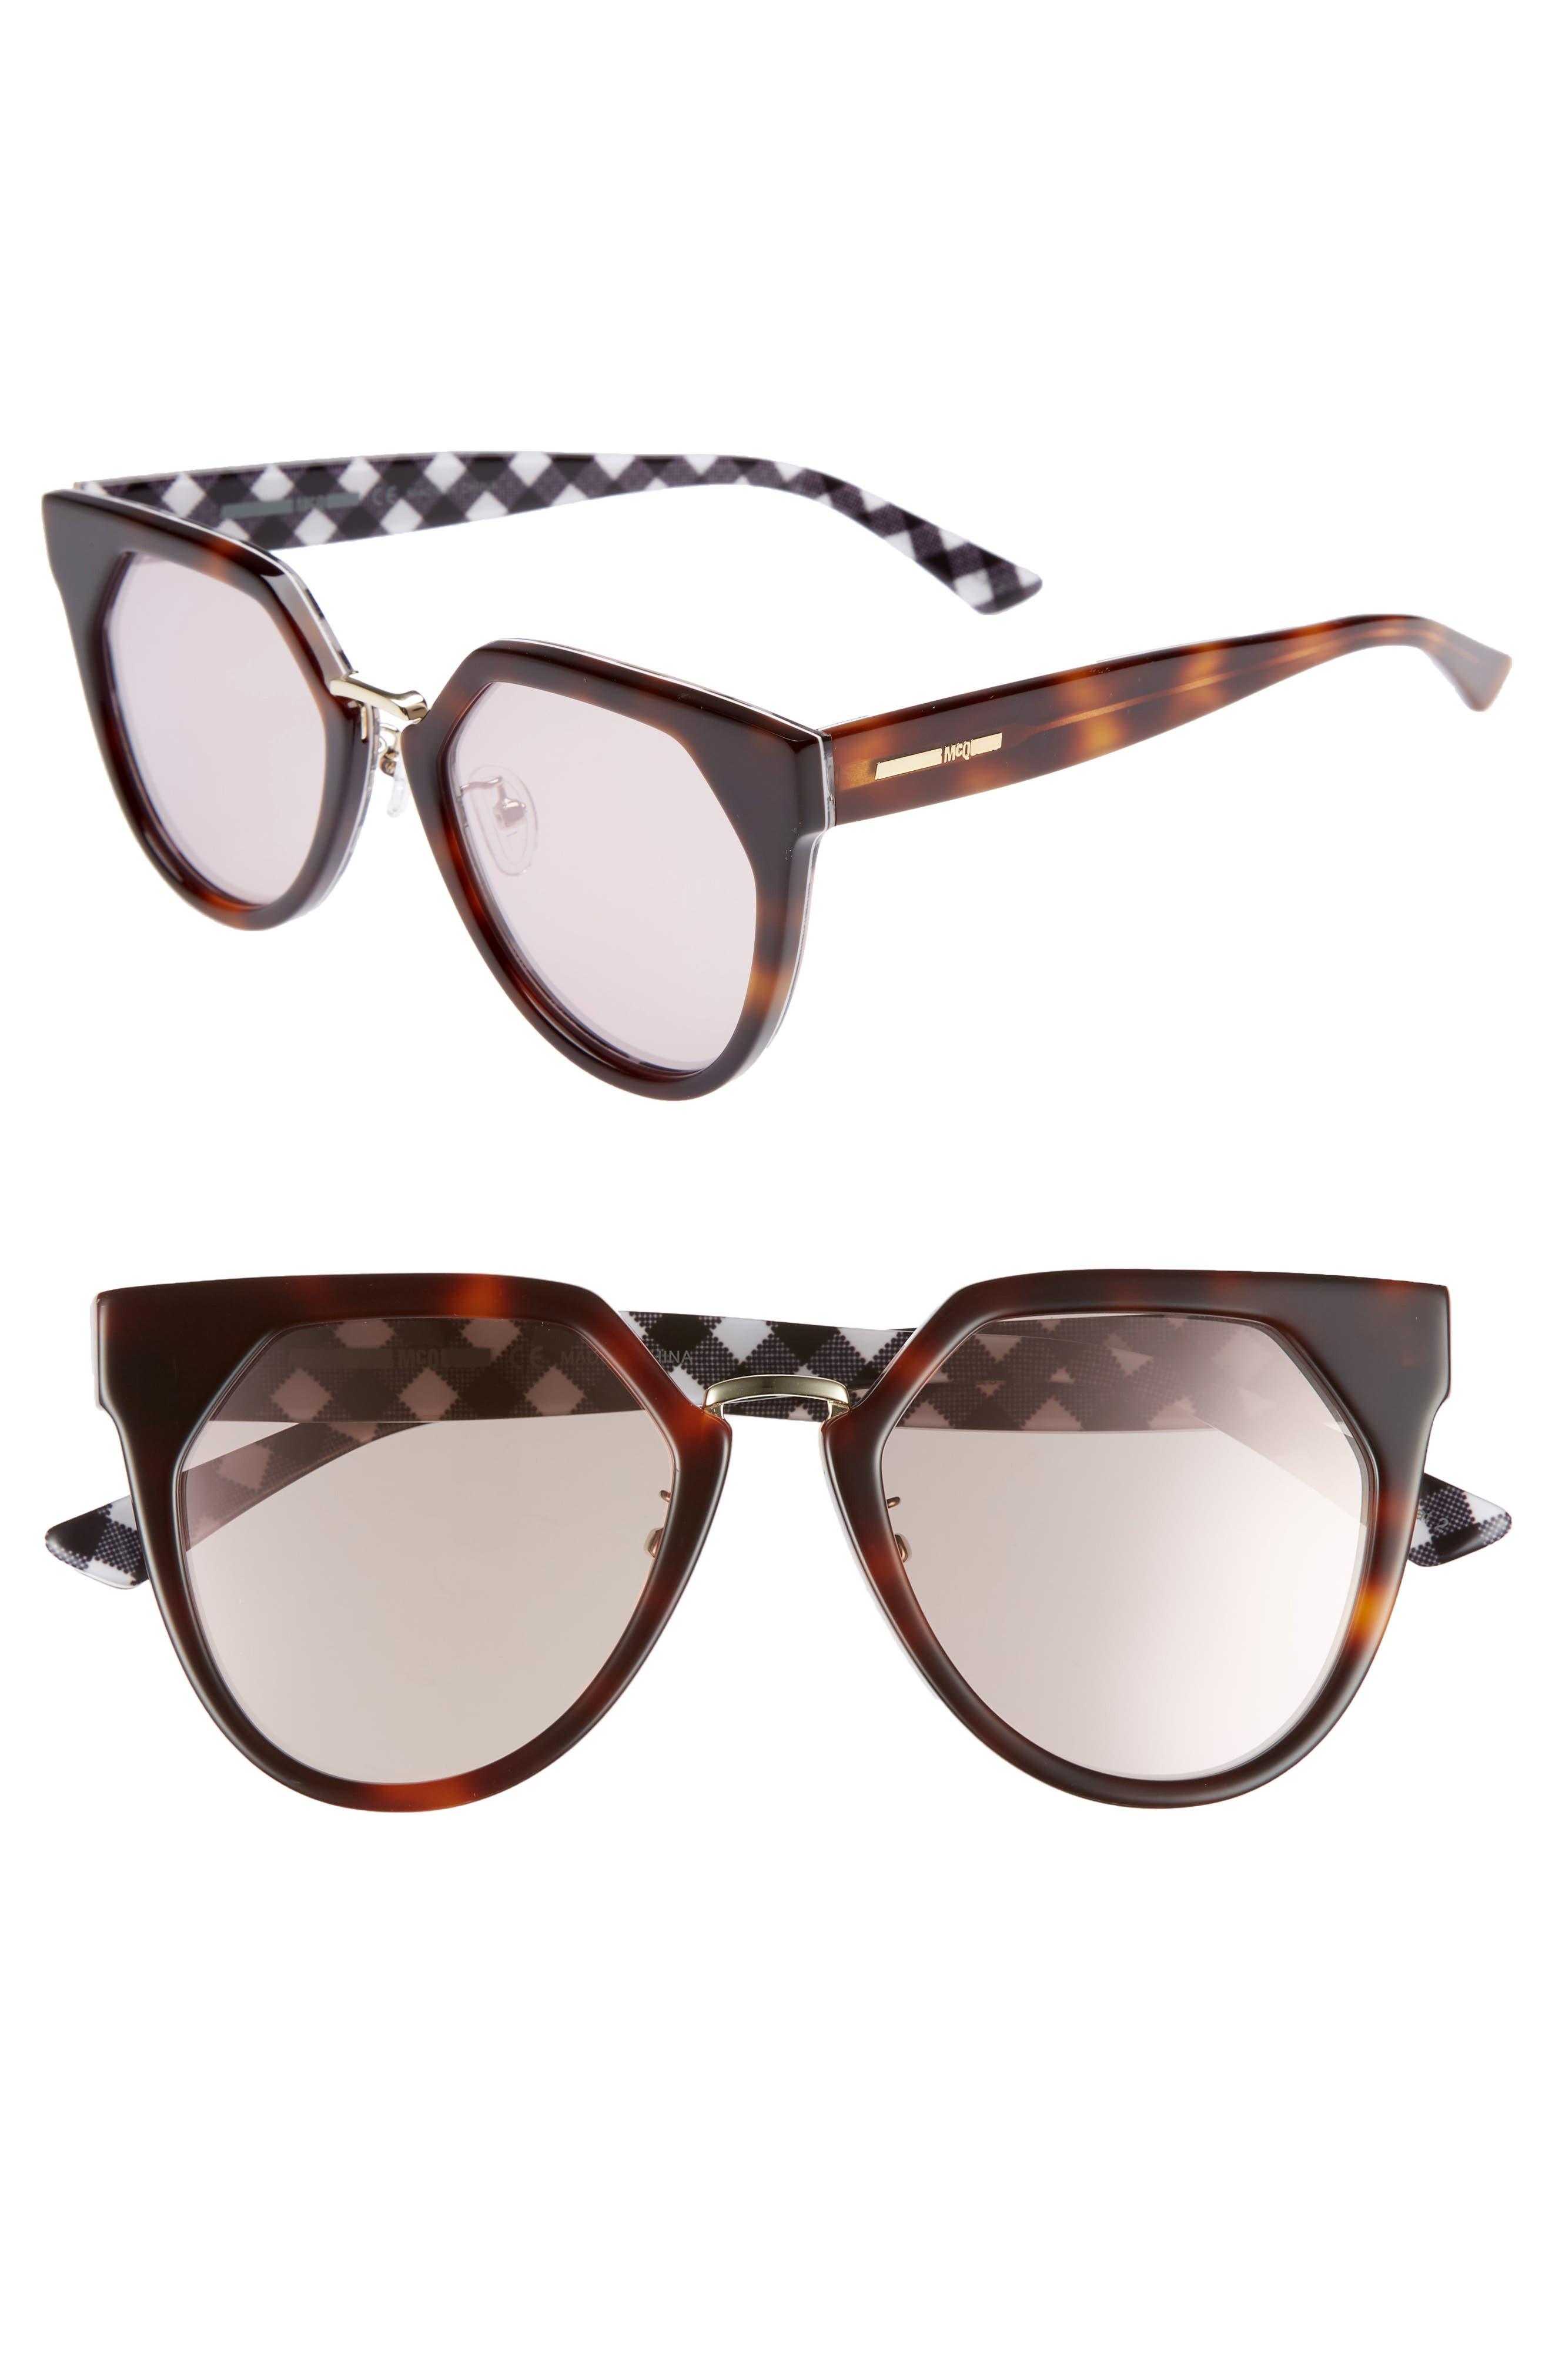 53mm Cat Eye Sunglasses,                             Main thumbnail 1, color,                             Havana